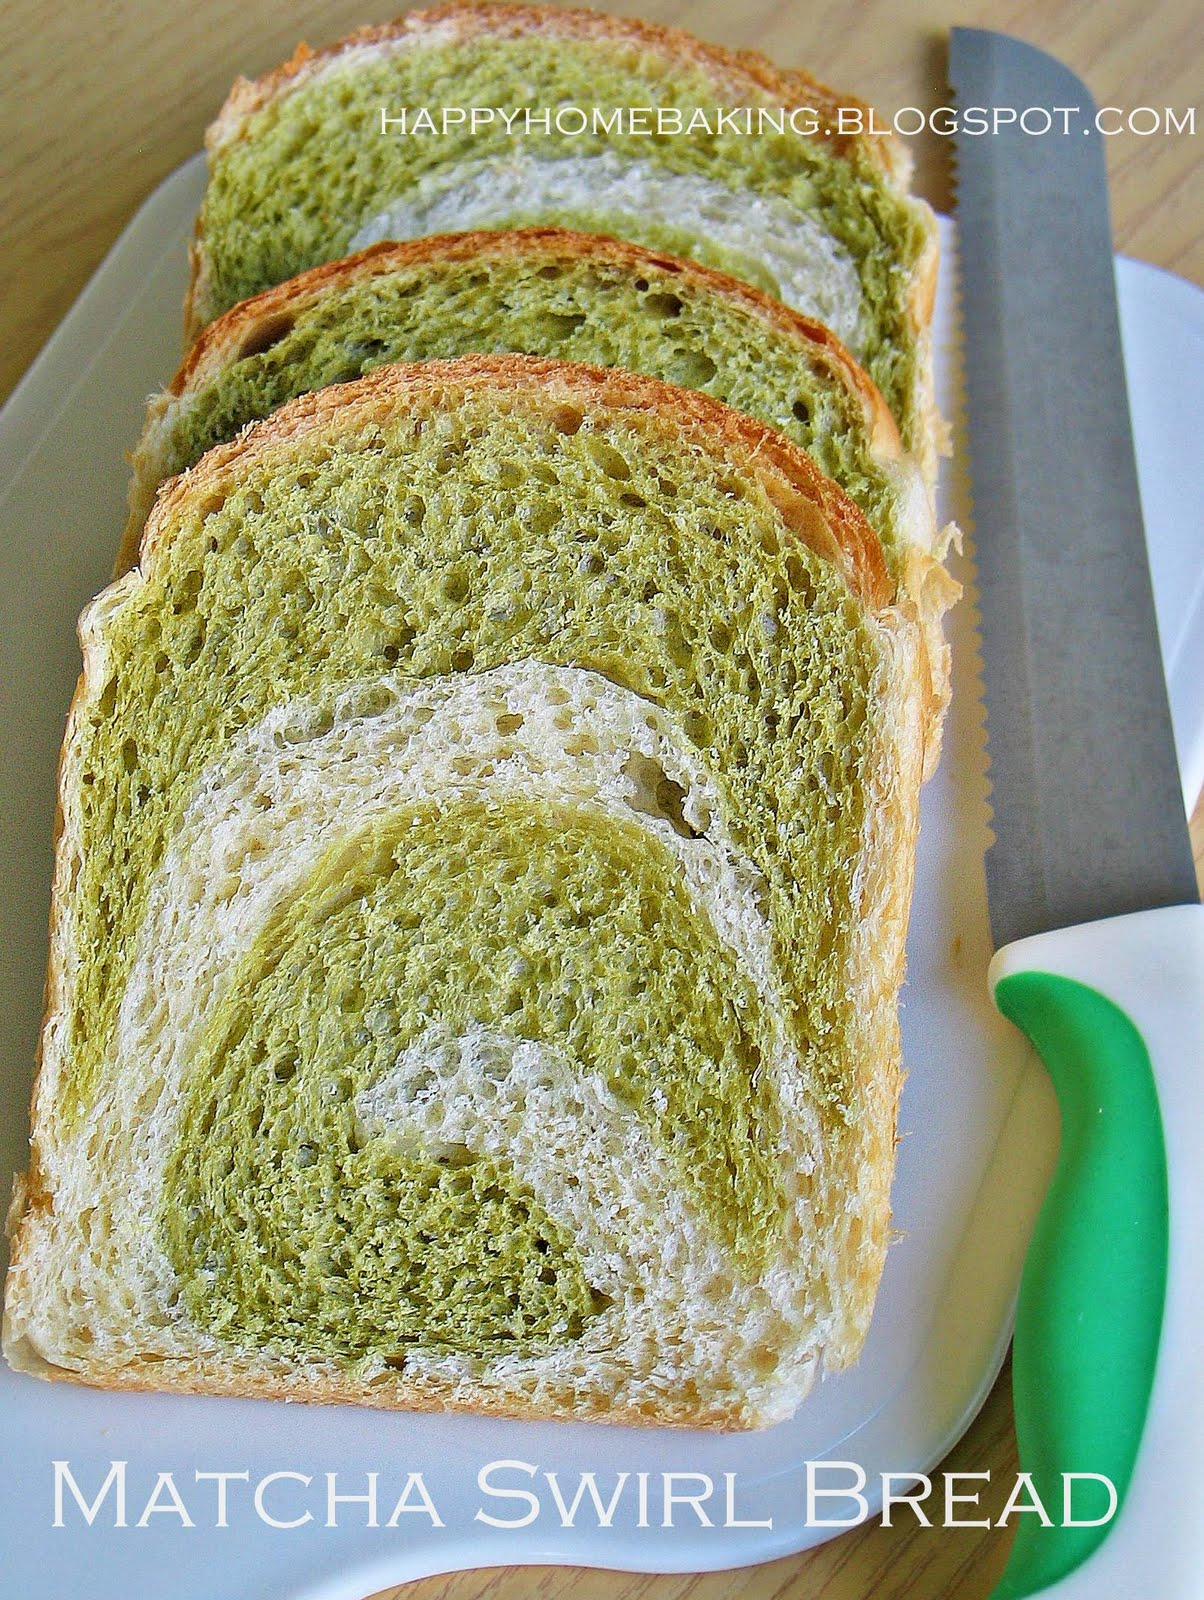 https://i0.wp.com/3.bp.blogspot.com/_Q5SpTKazer0/THG00DhbcYI/AAAAAAAAGhY/t9-2Z9ey8N8/s1600/matcha+swirl+bread+1.JPG?resize=389%2C515